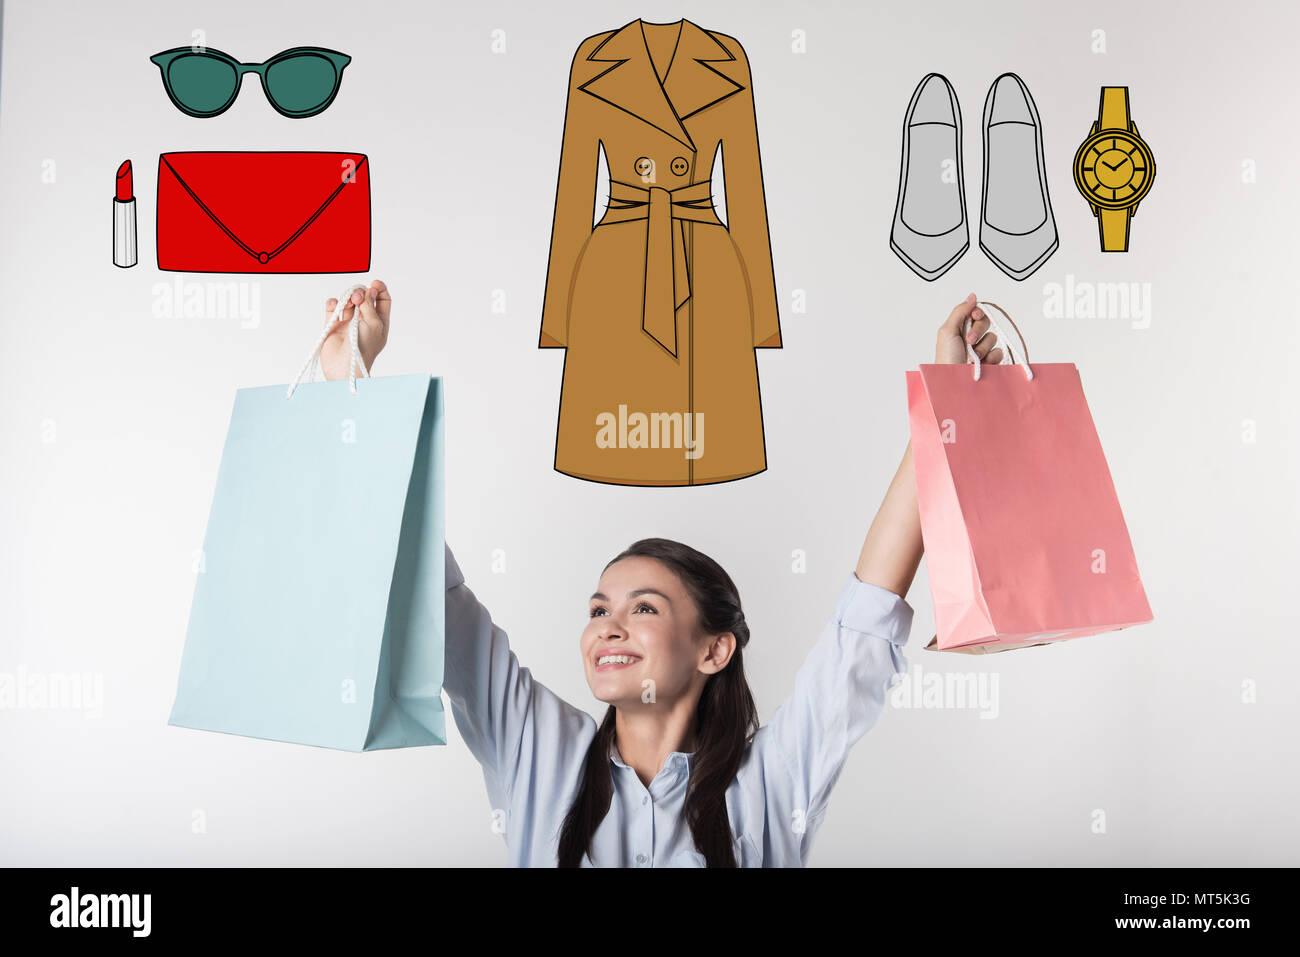 Emotional secretary feeling happy while buying clothes for work - Stock Image